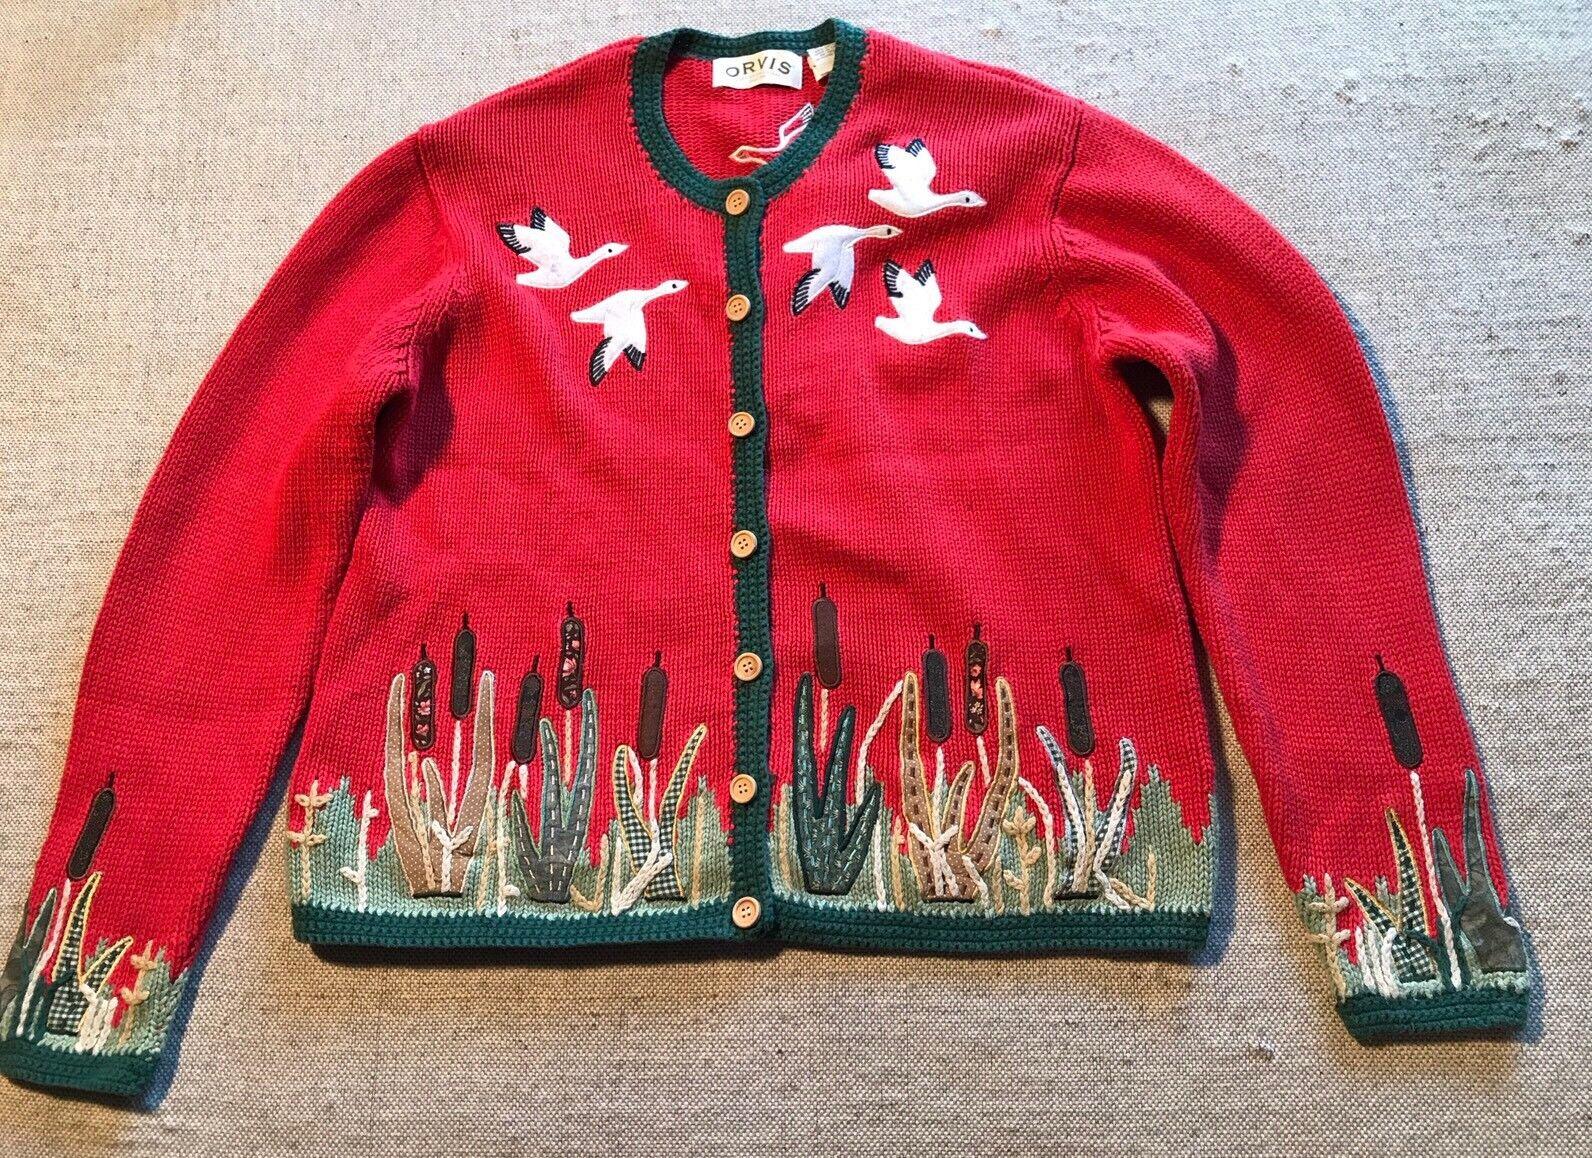 ORVIS Cardigan Sweater Desert Desert Desert Cactus Birds Embroidery Hand Knit Size L Womens  I 6c4d8f